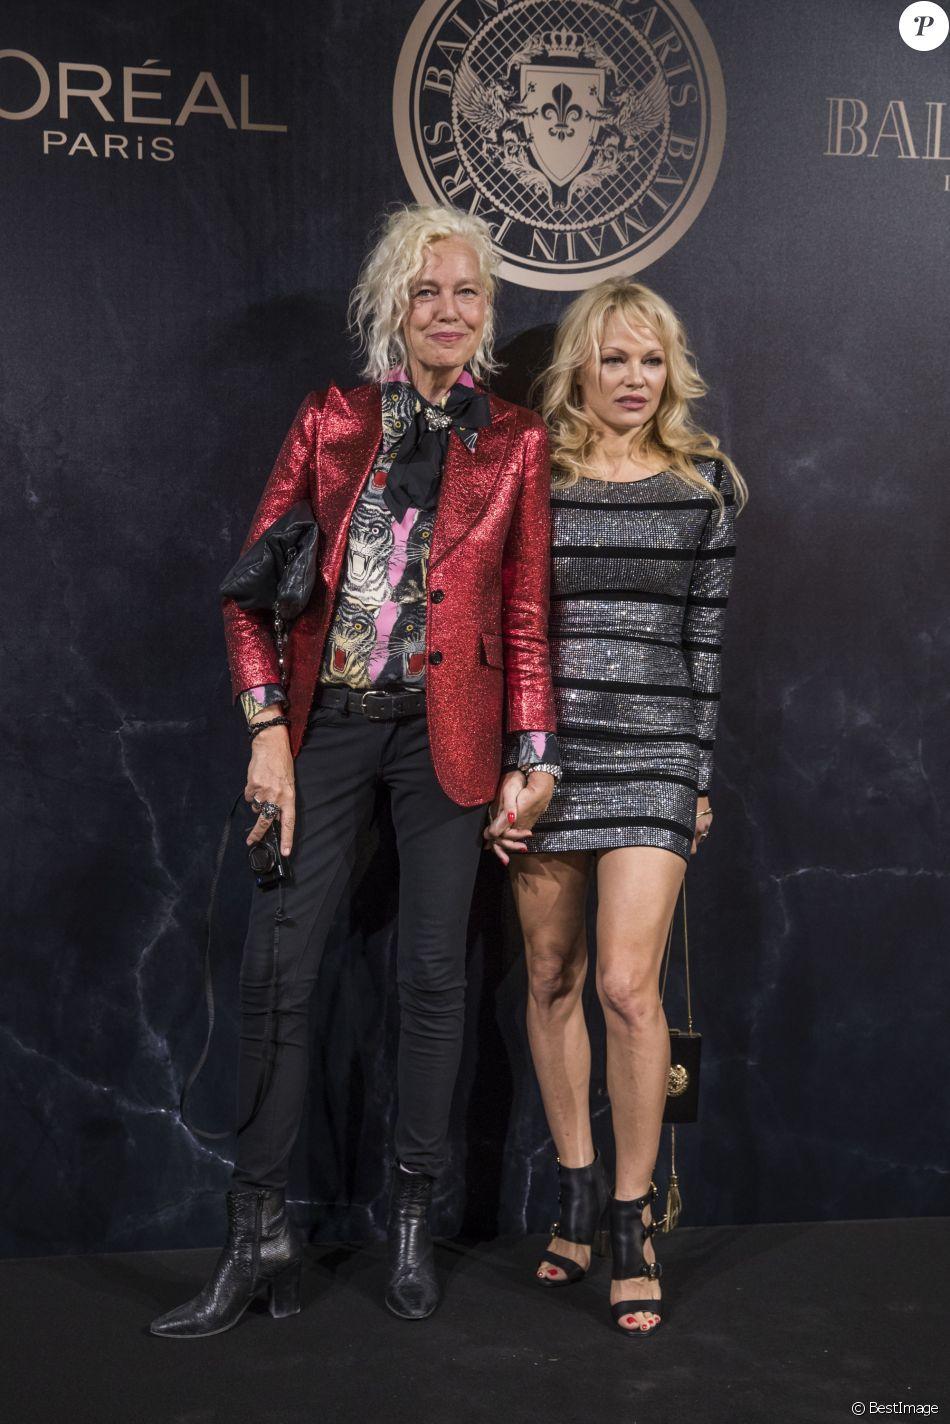 Watch 28. Pamela Anderson video